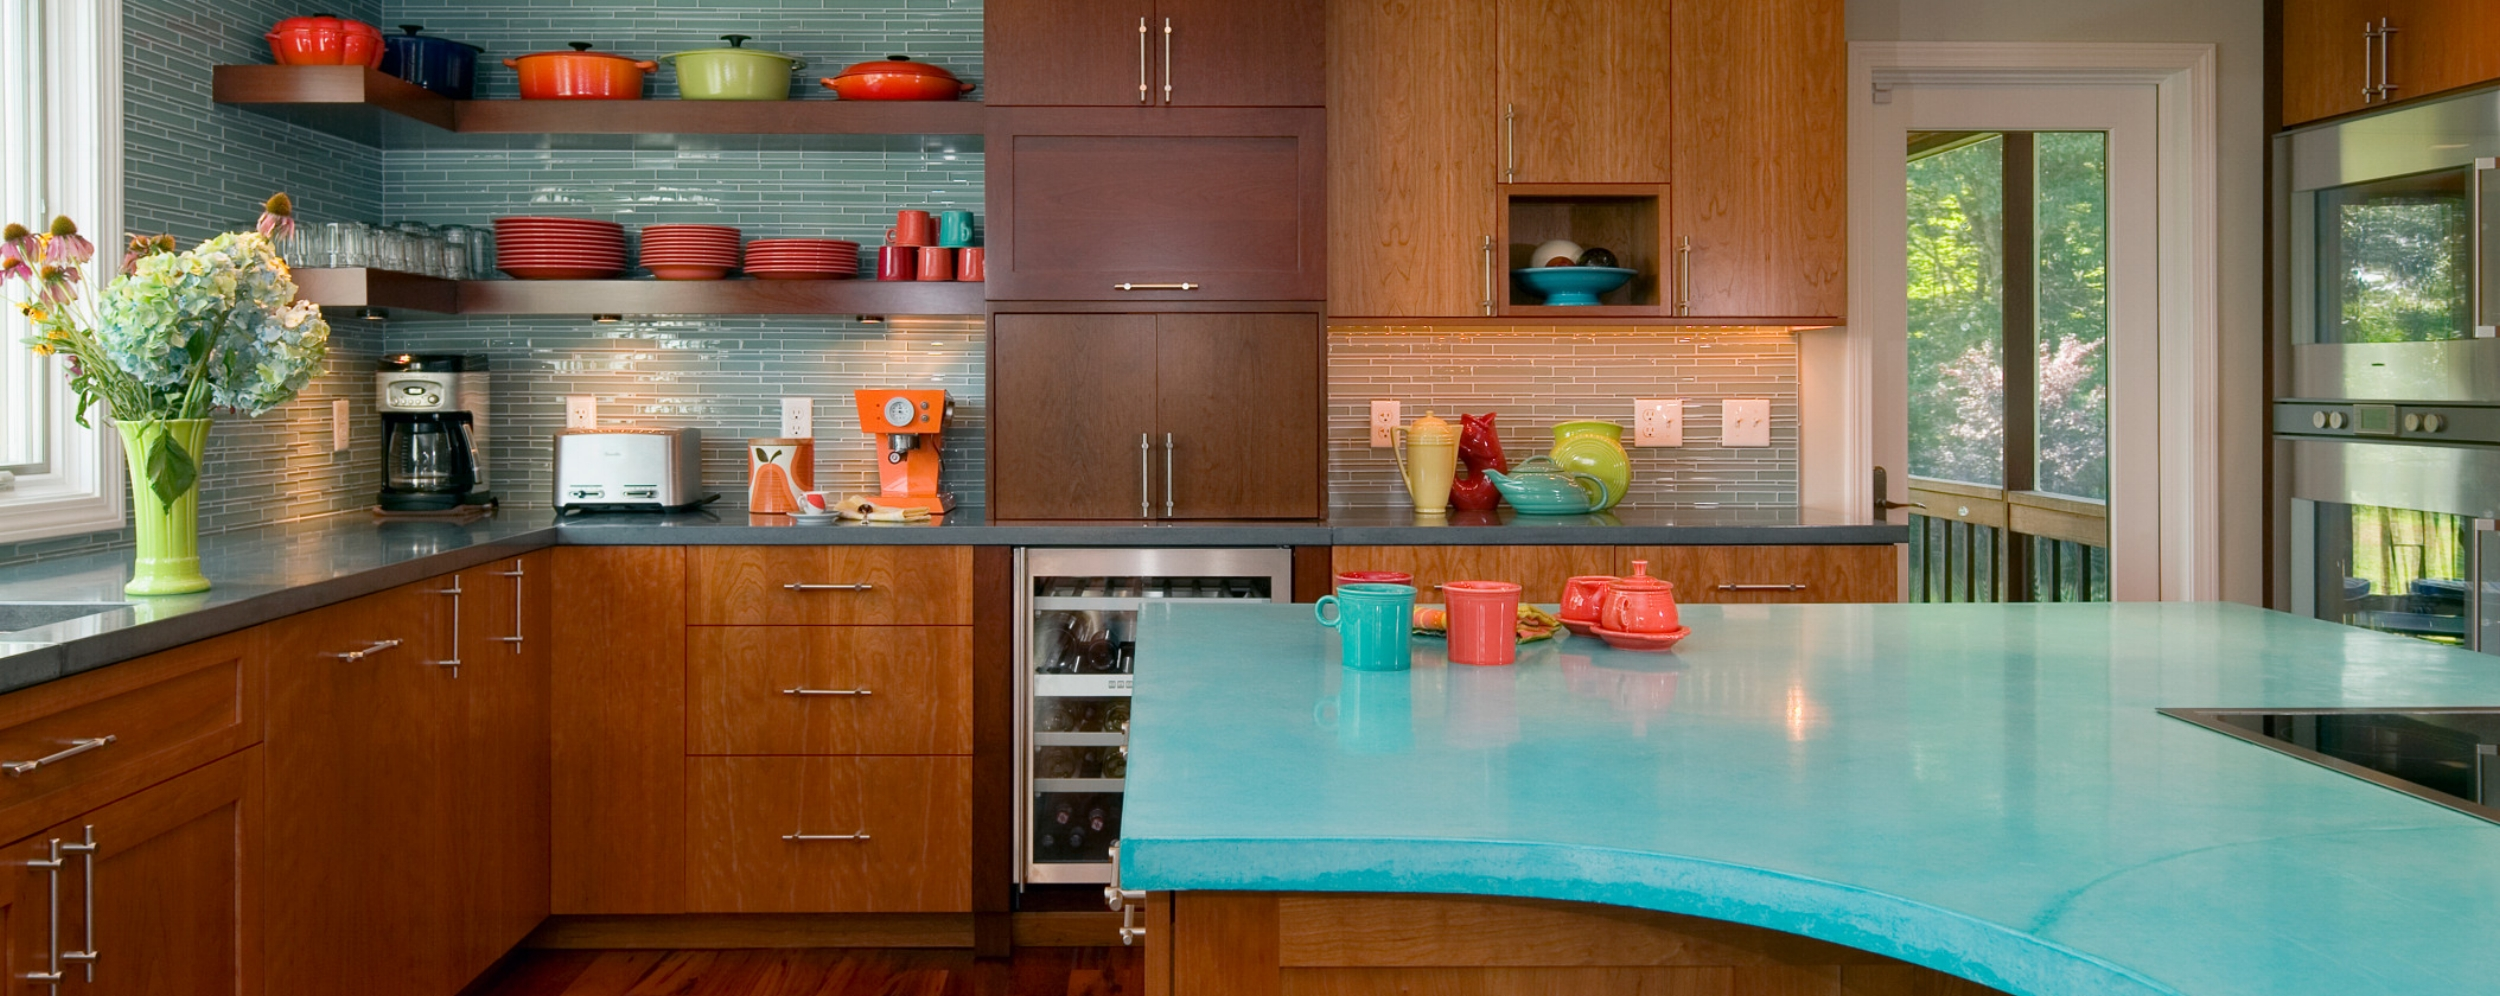 Boston-modern-transitional-colorful-kitchen (20).jpg